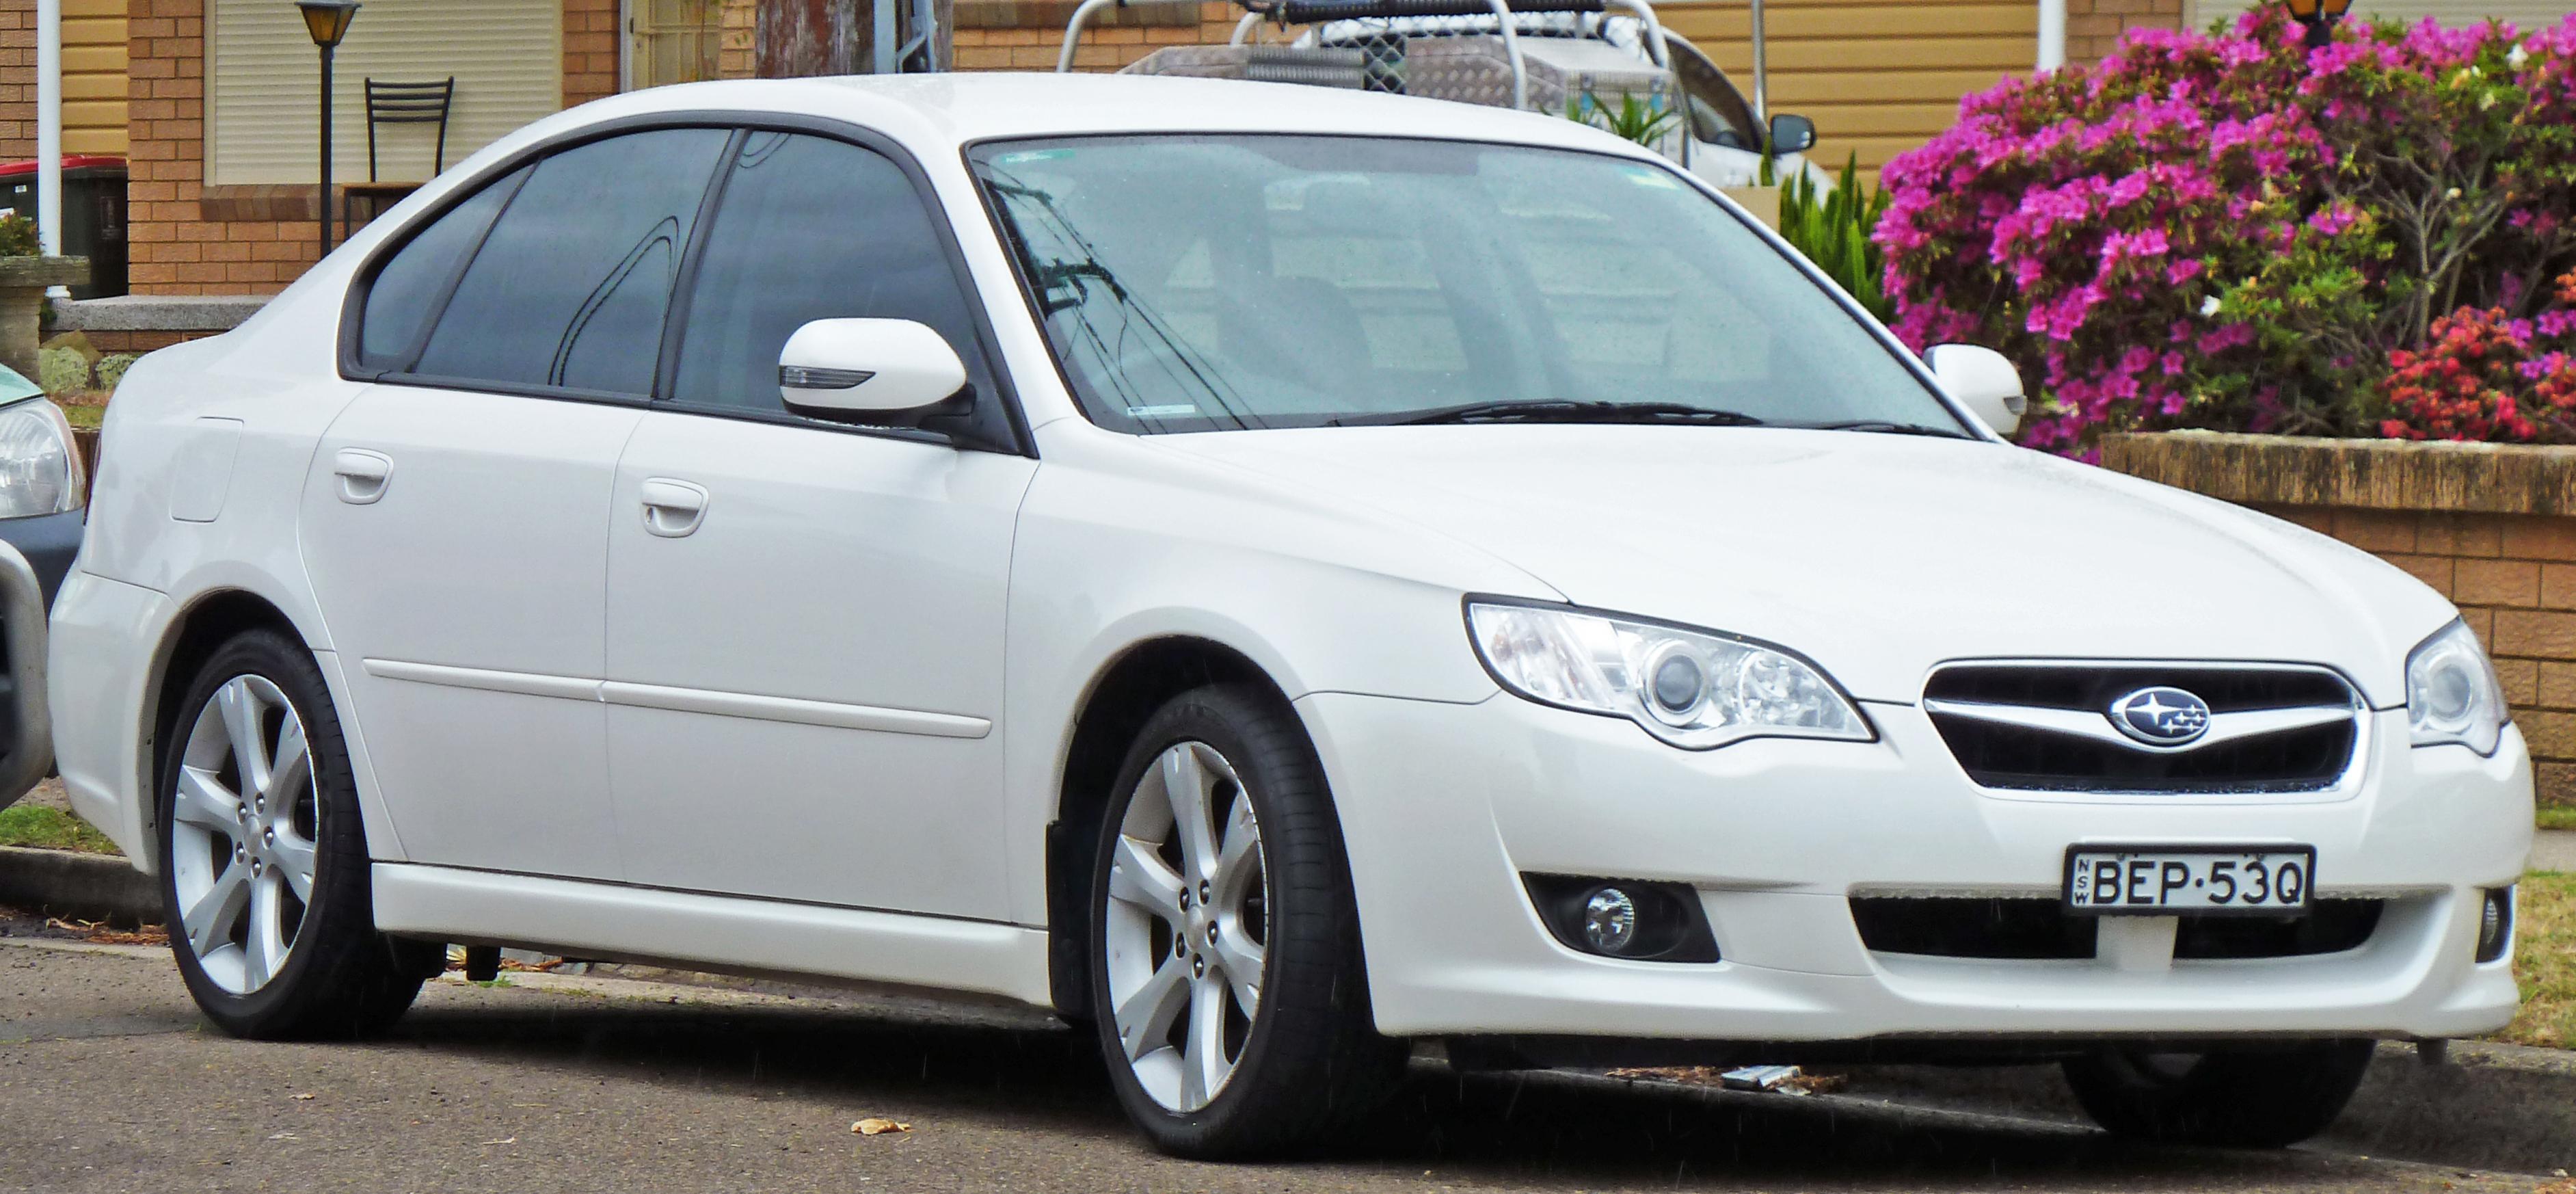 Subaru Legacy | Wiki & Review | Everipedia